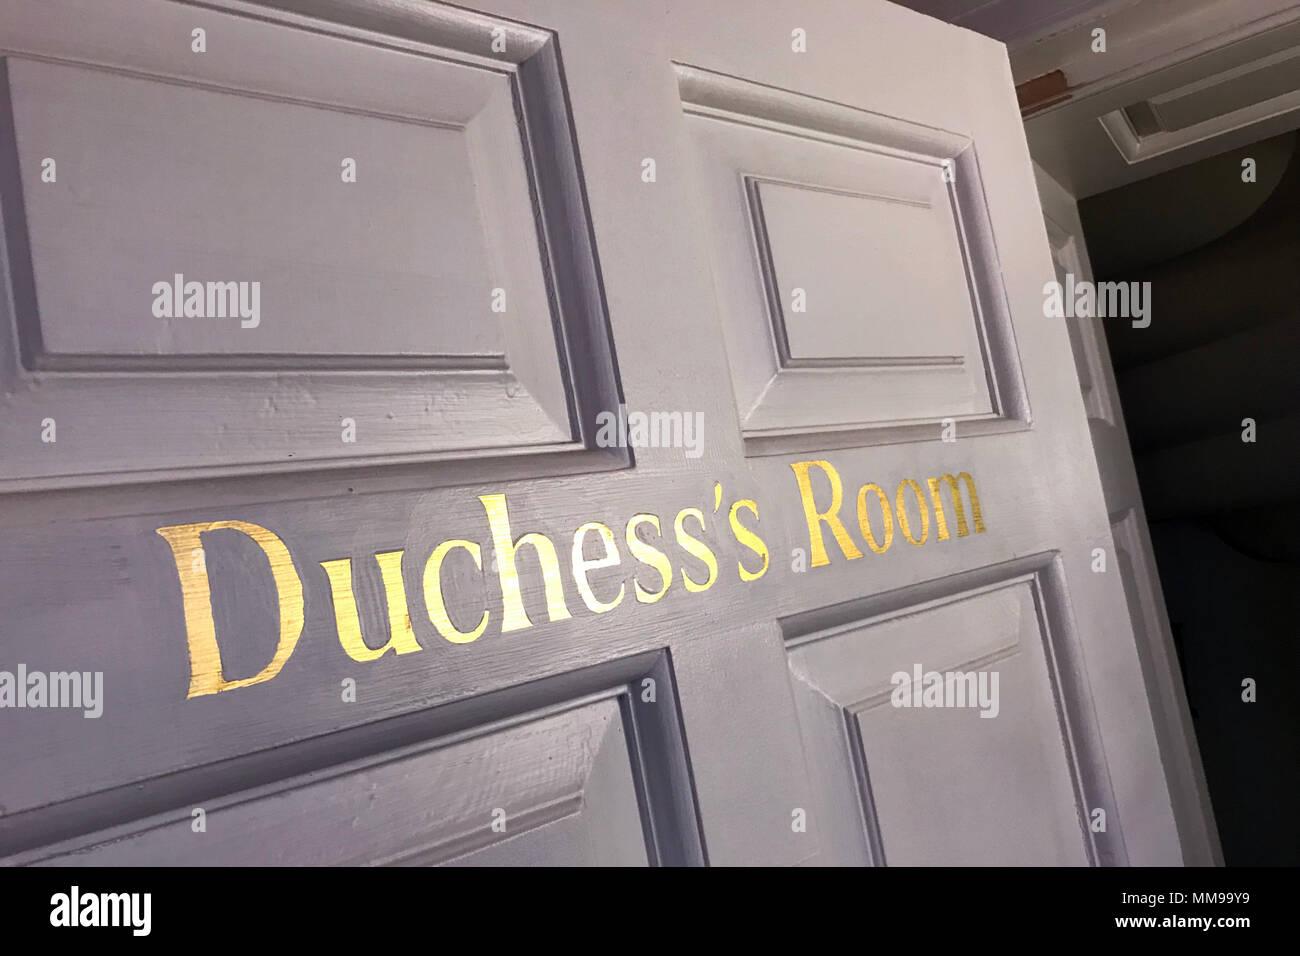 GoTonysmith,@HotpixUK,door,Duchess,Duchess room,Scotland,UK,south,Lanarkshire,Country Park,posh,wedding,venue,location,Scottish,manor,house